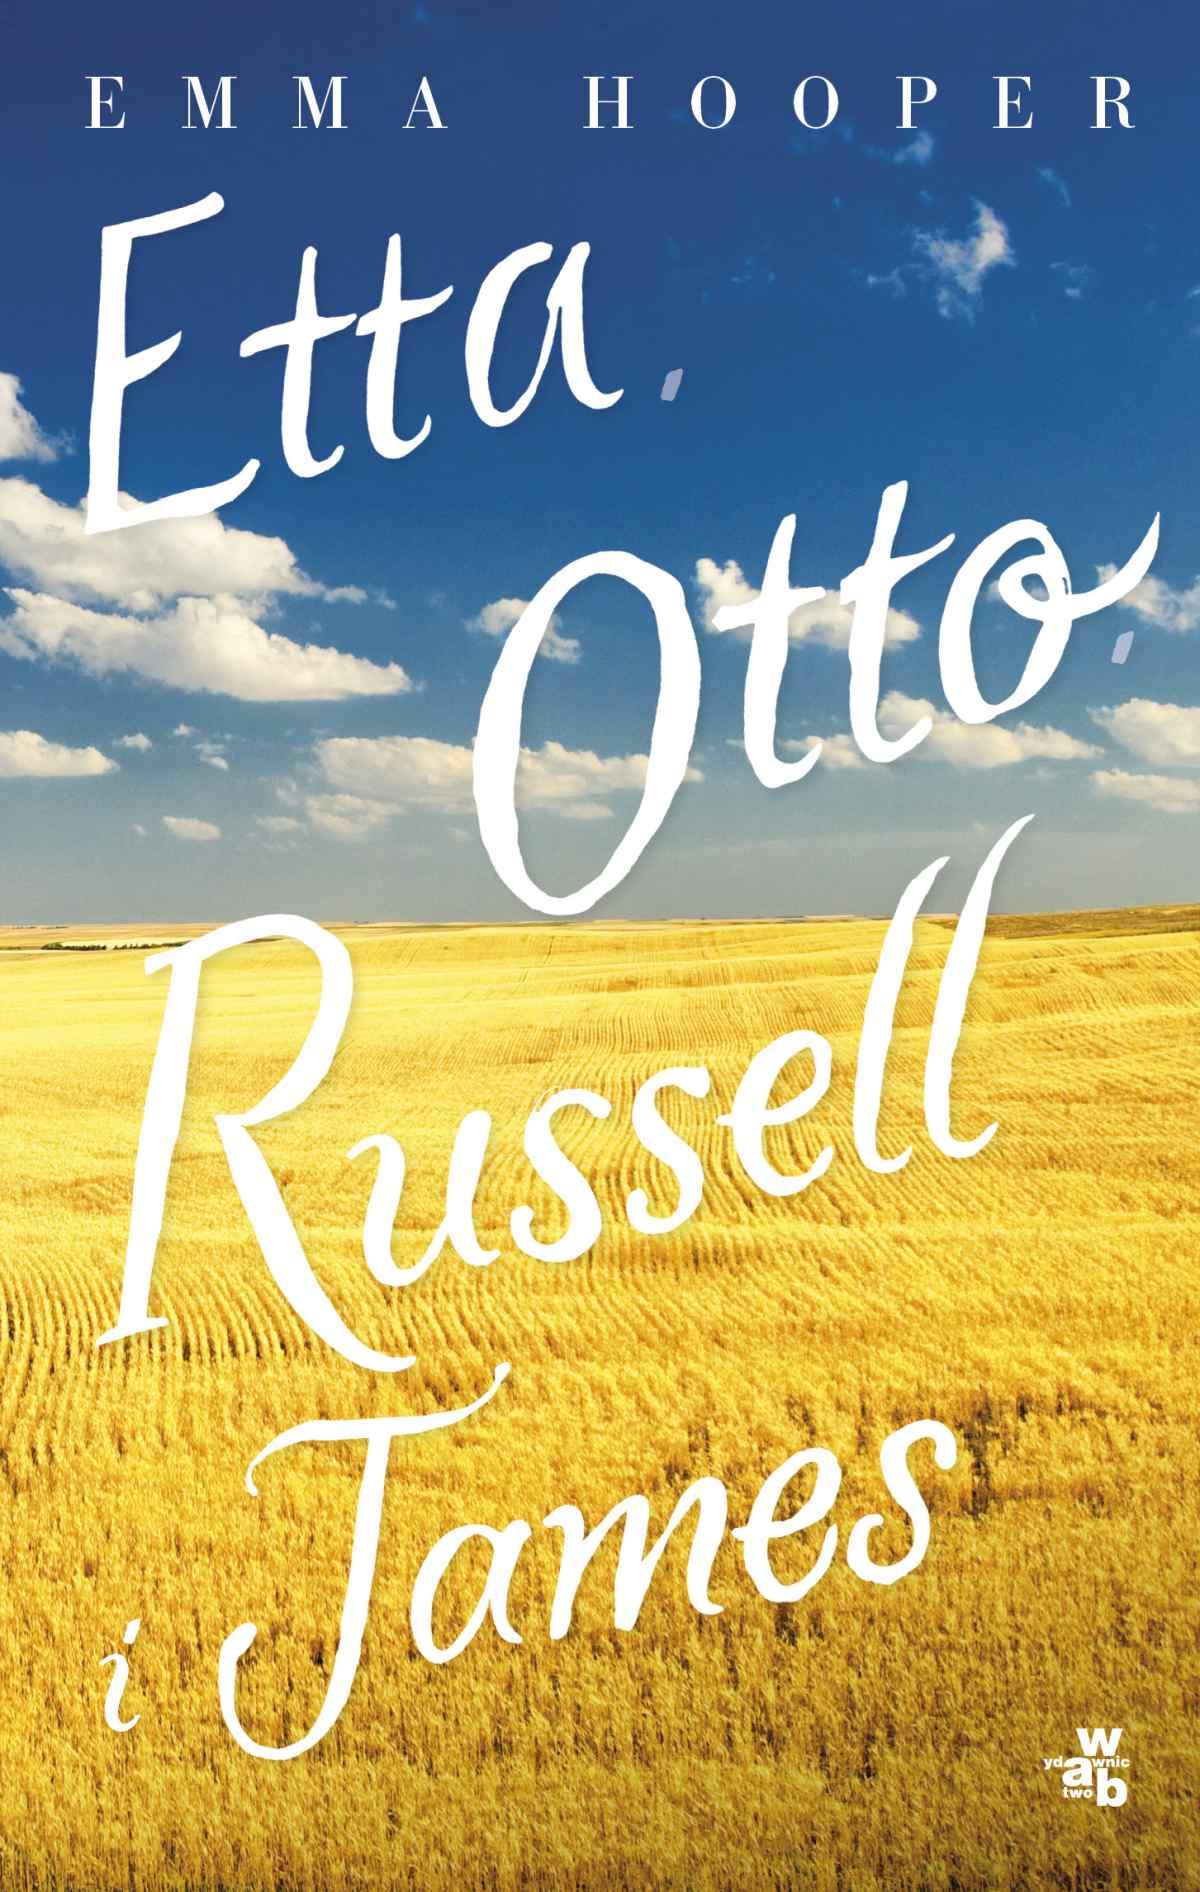 Etta, Otto, Russell i James - Ebook (Książka EPUB) do pobrania w formacie EPUB